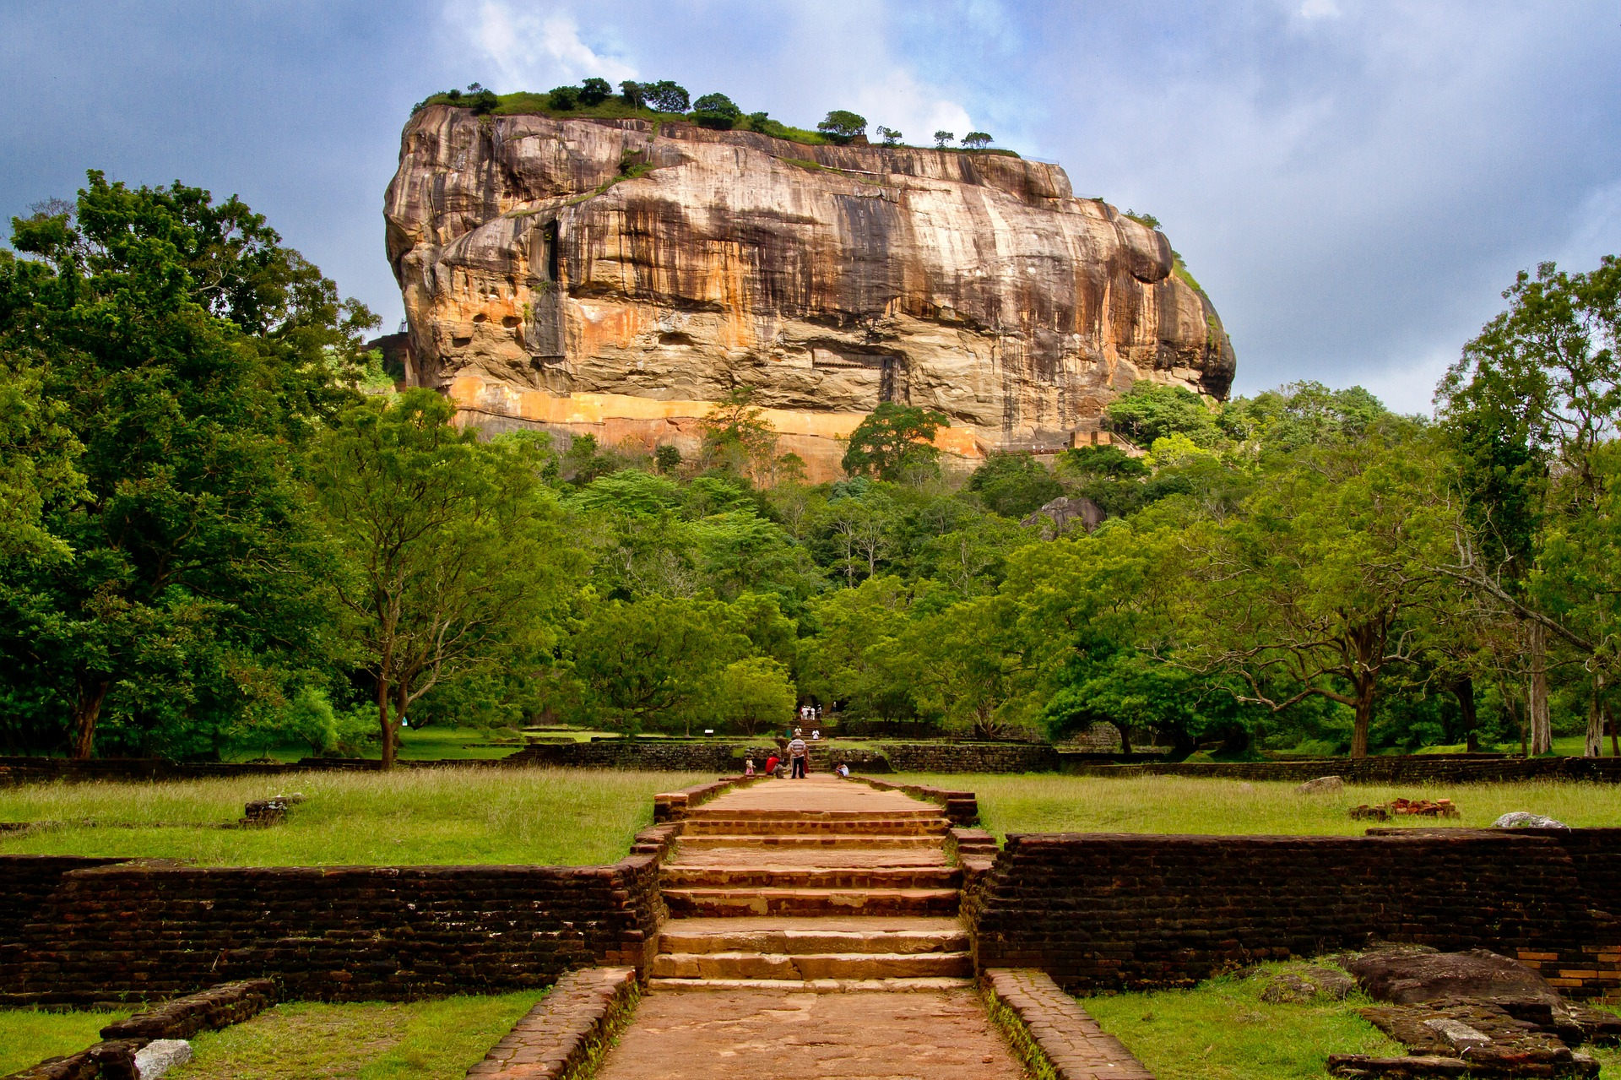 Sigiriya 8 Things To Know Before Visiting